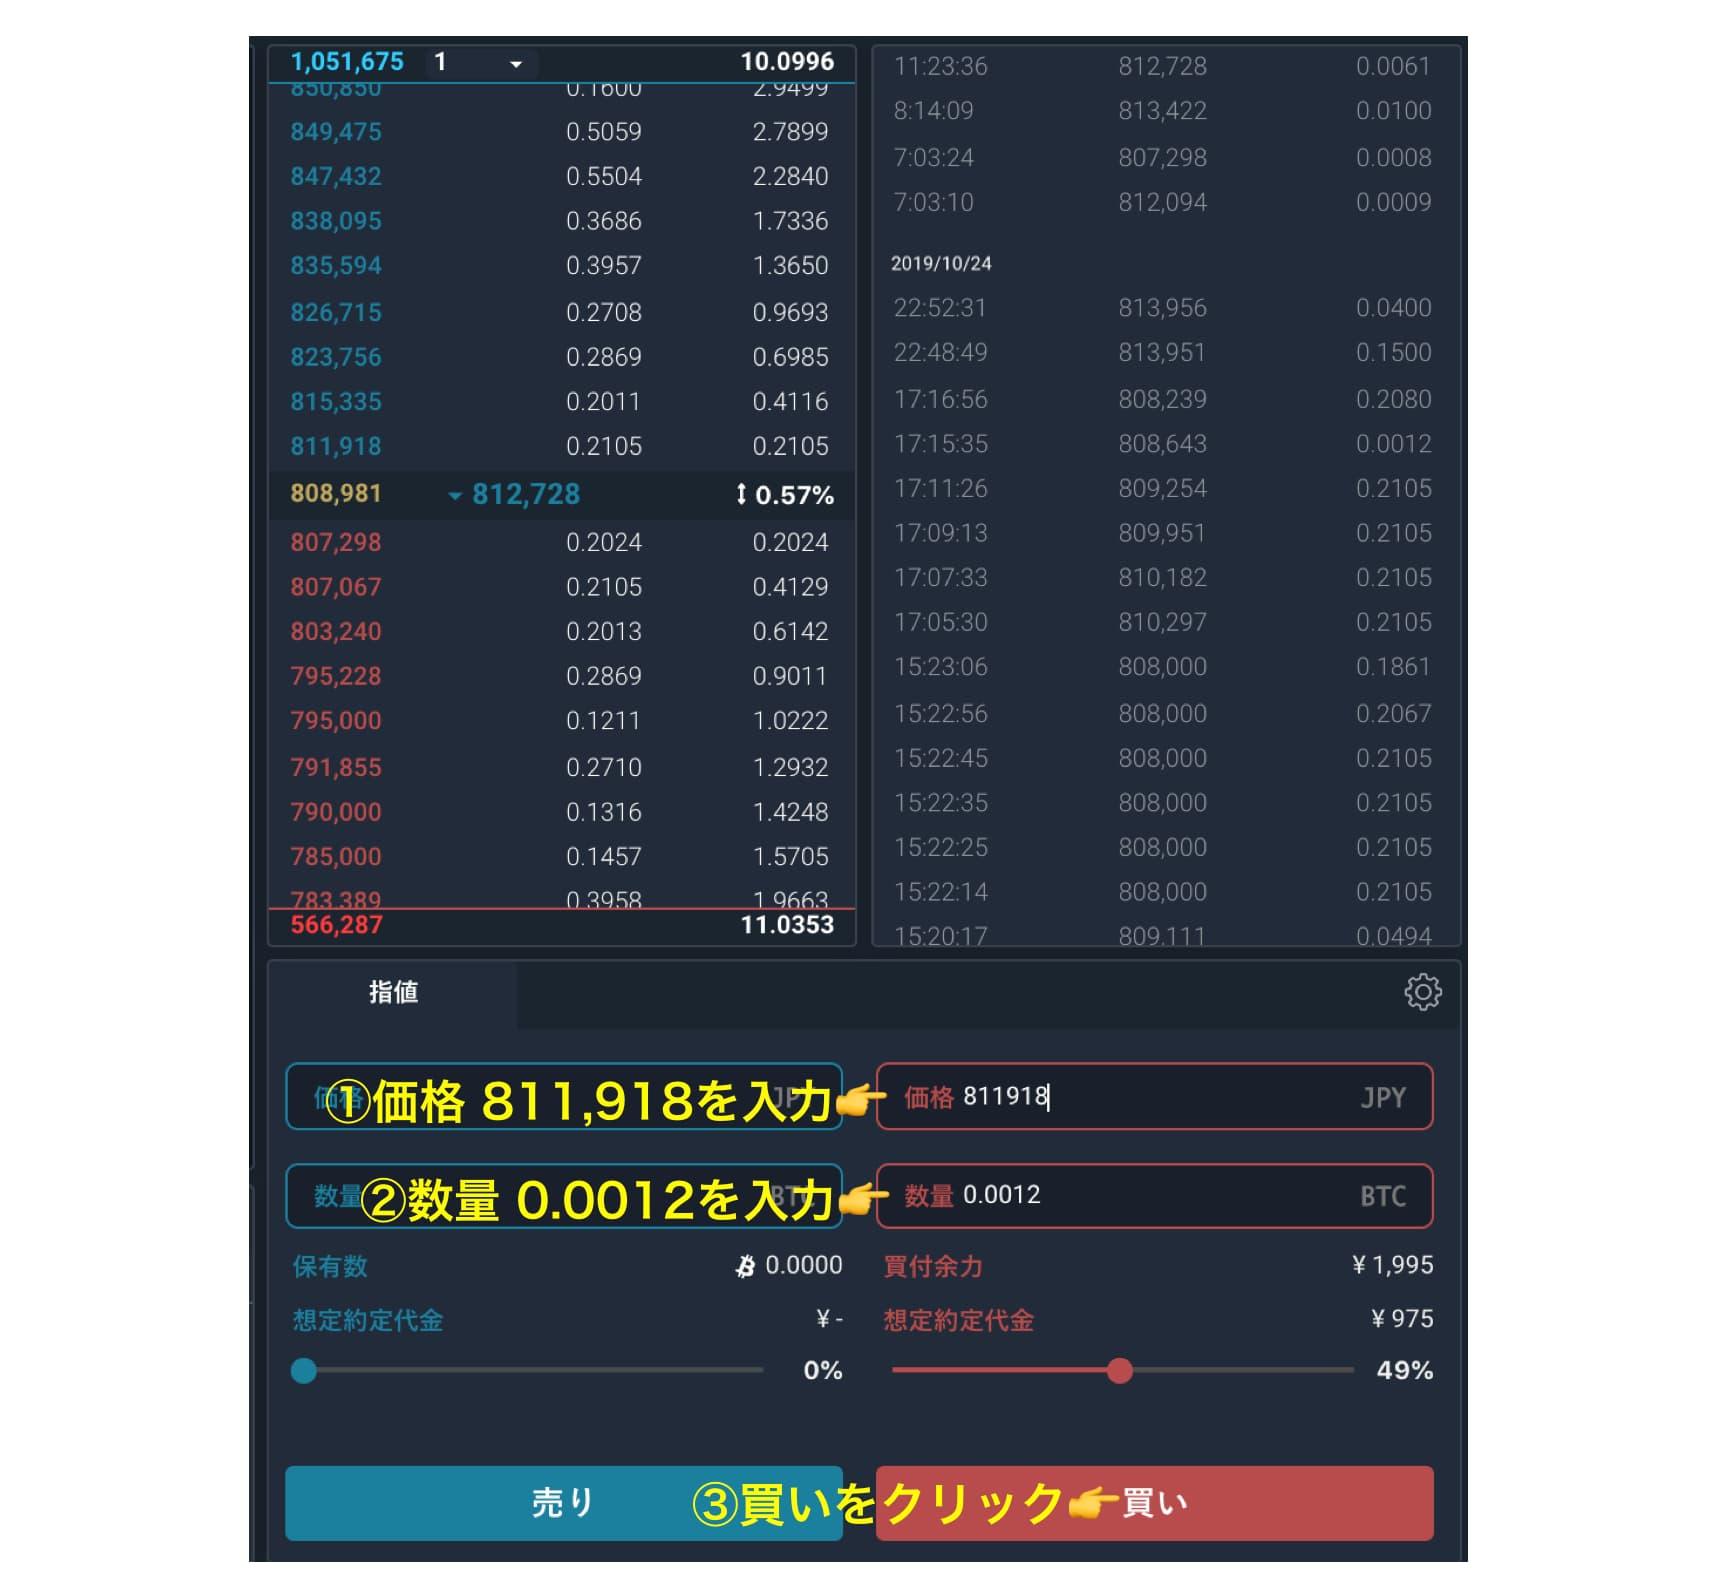 BTCJPYの購入画面